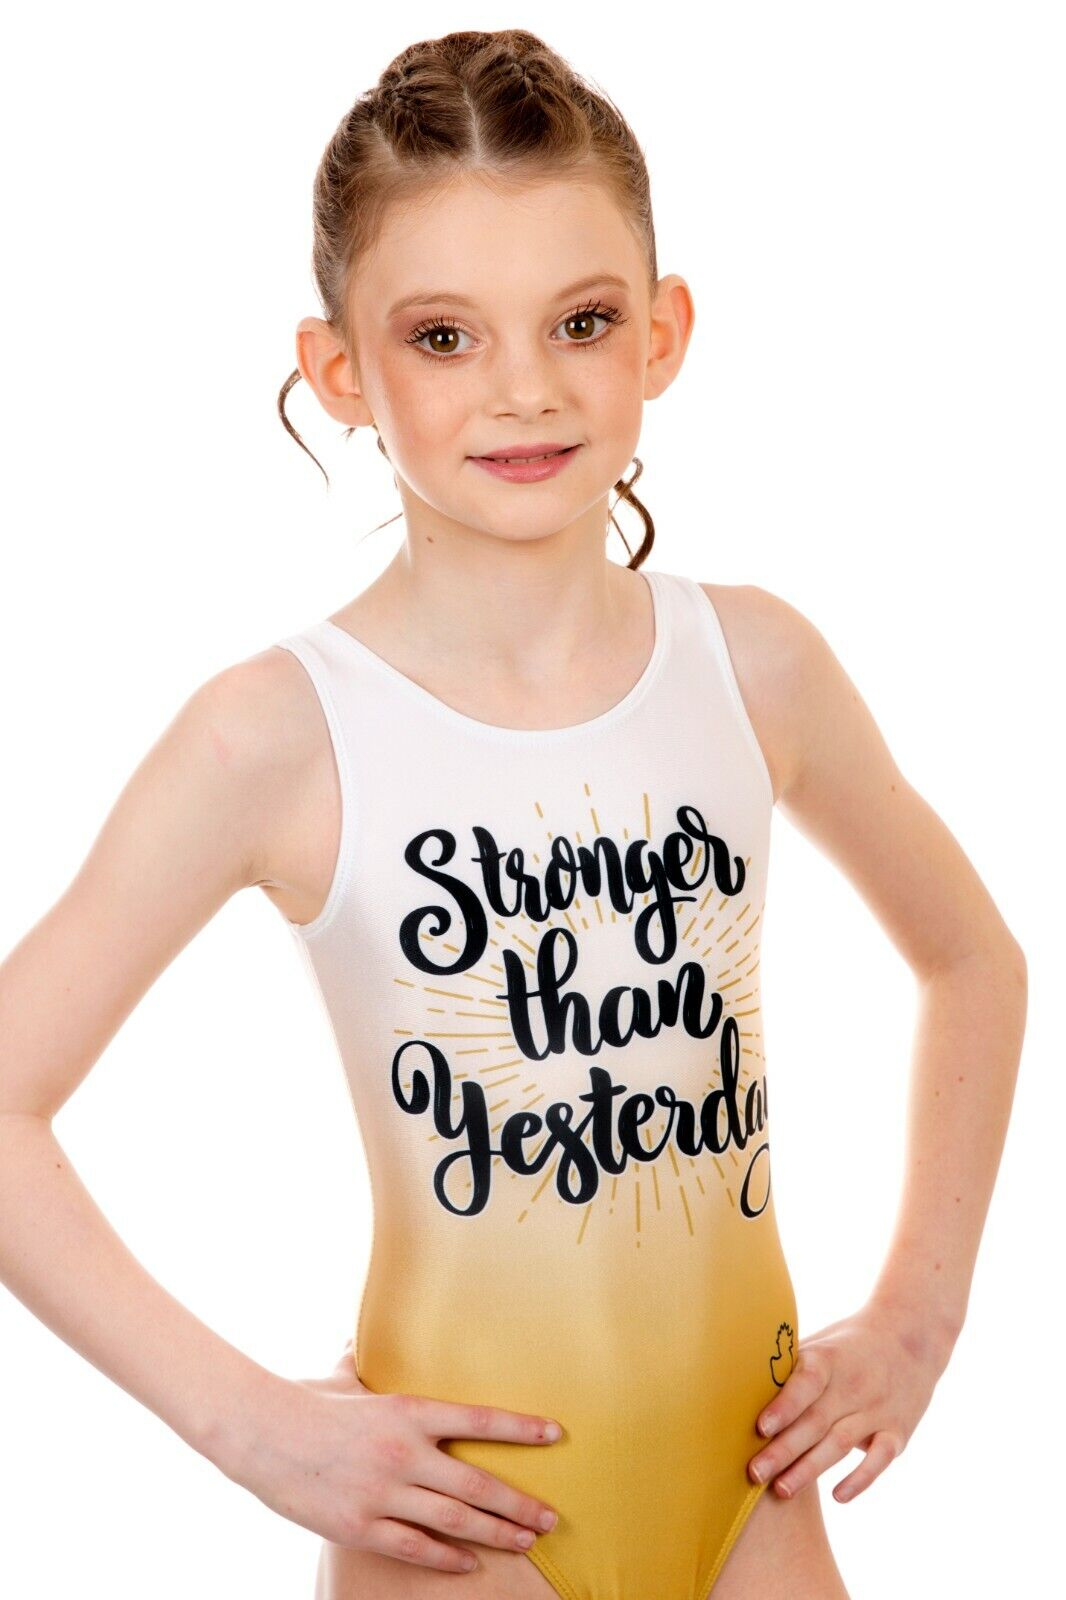 Girls Gymnastics Lyrca Leotard Ballet Dance Bodysuit Sleeveless Outfit 3-16Y